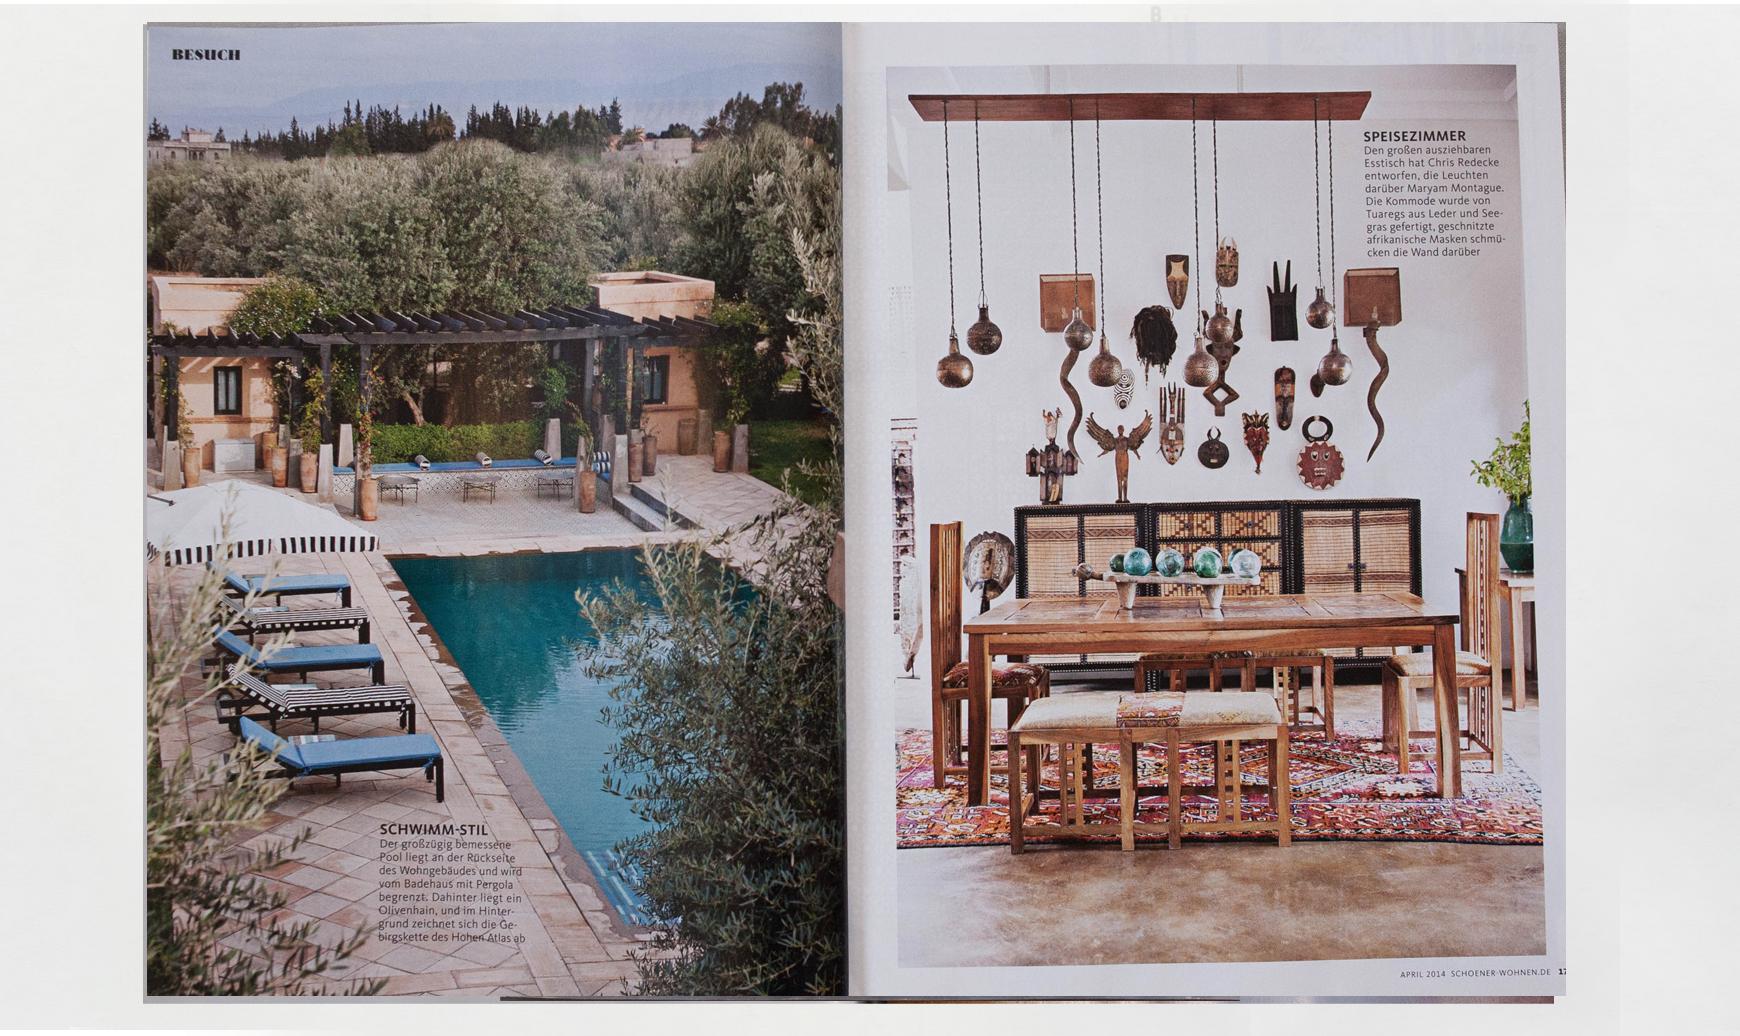 Peacock Pavilions boutique hotel in Marrakech, Morocco – Design by M. Montague - Schöner Wohnen